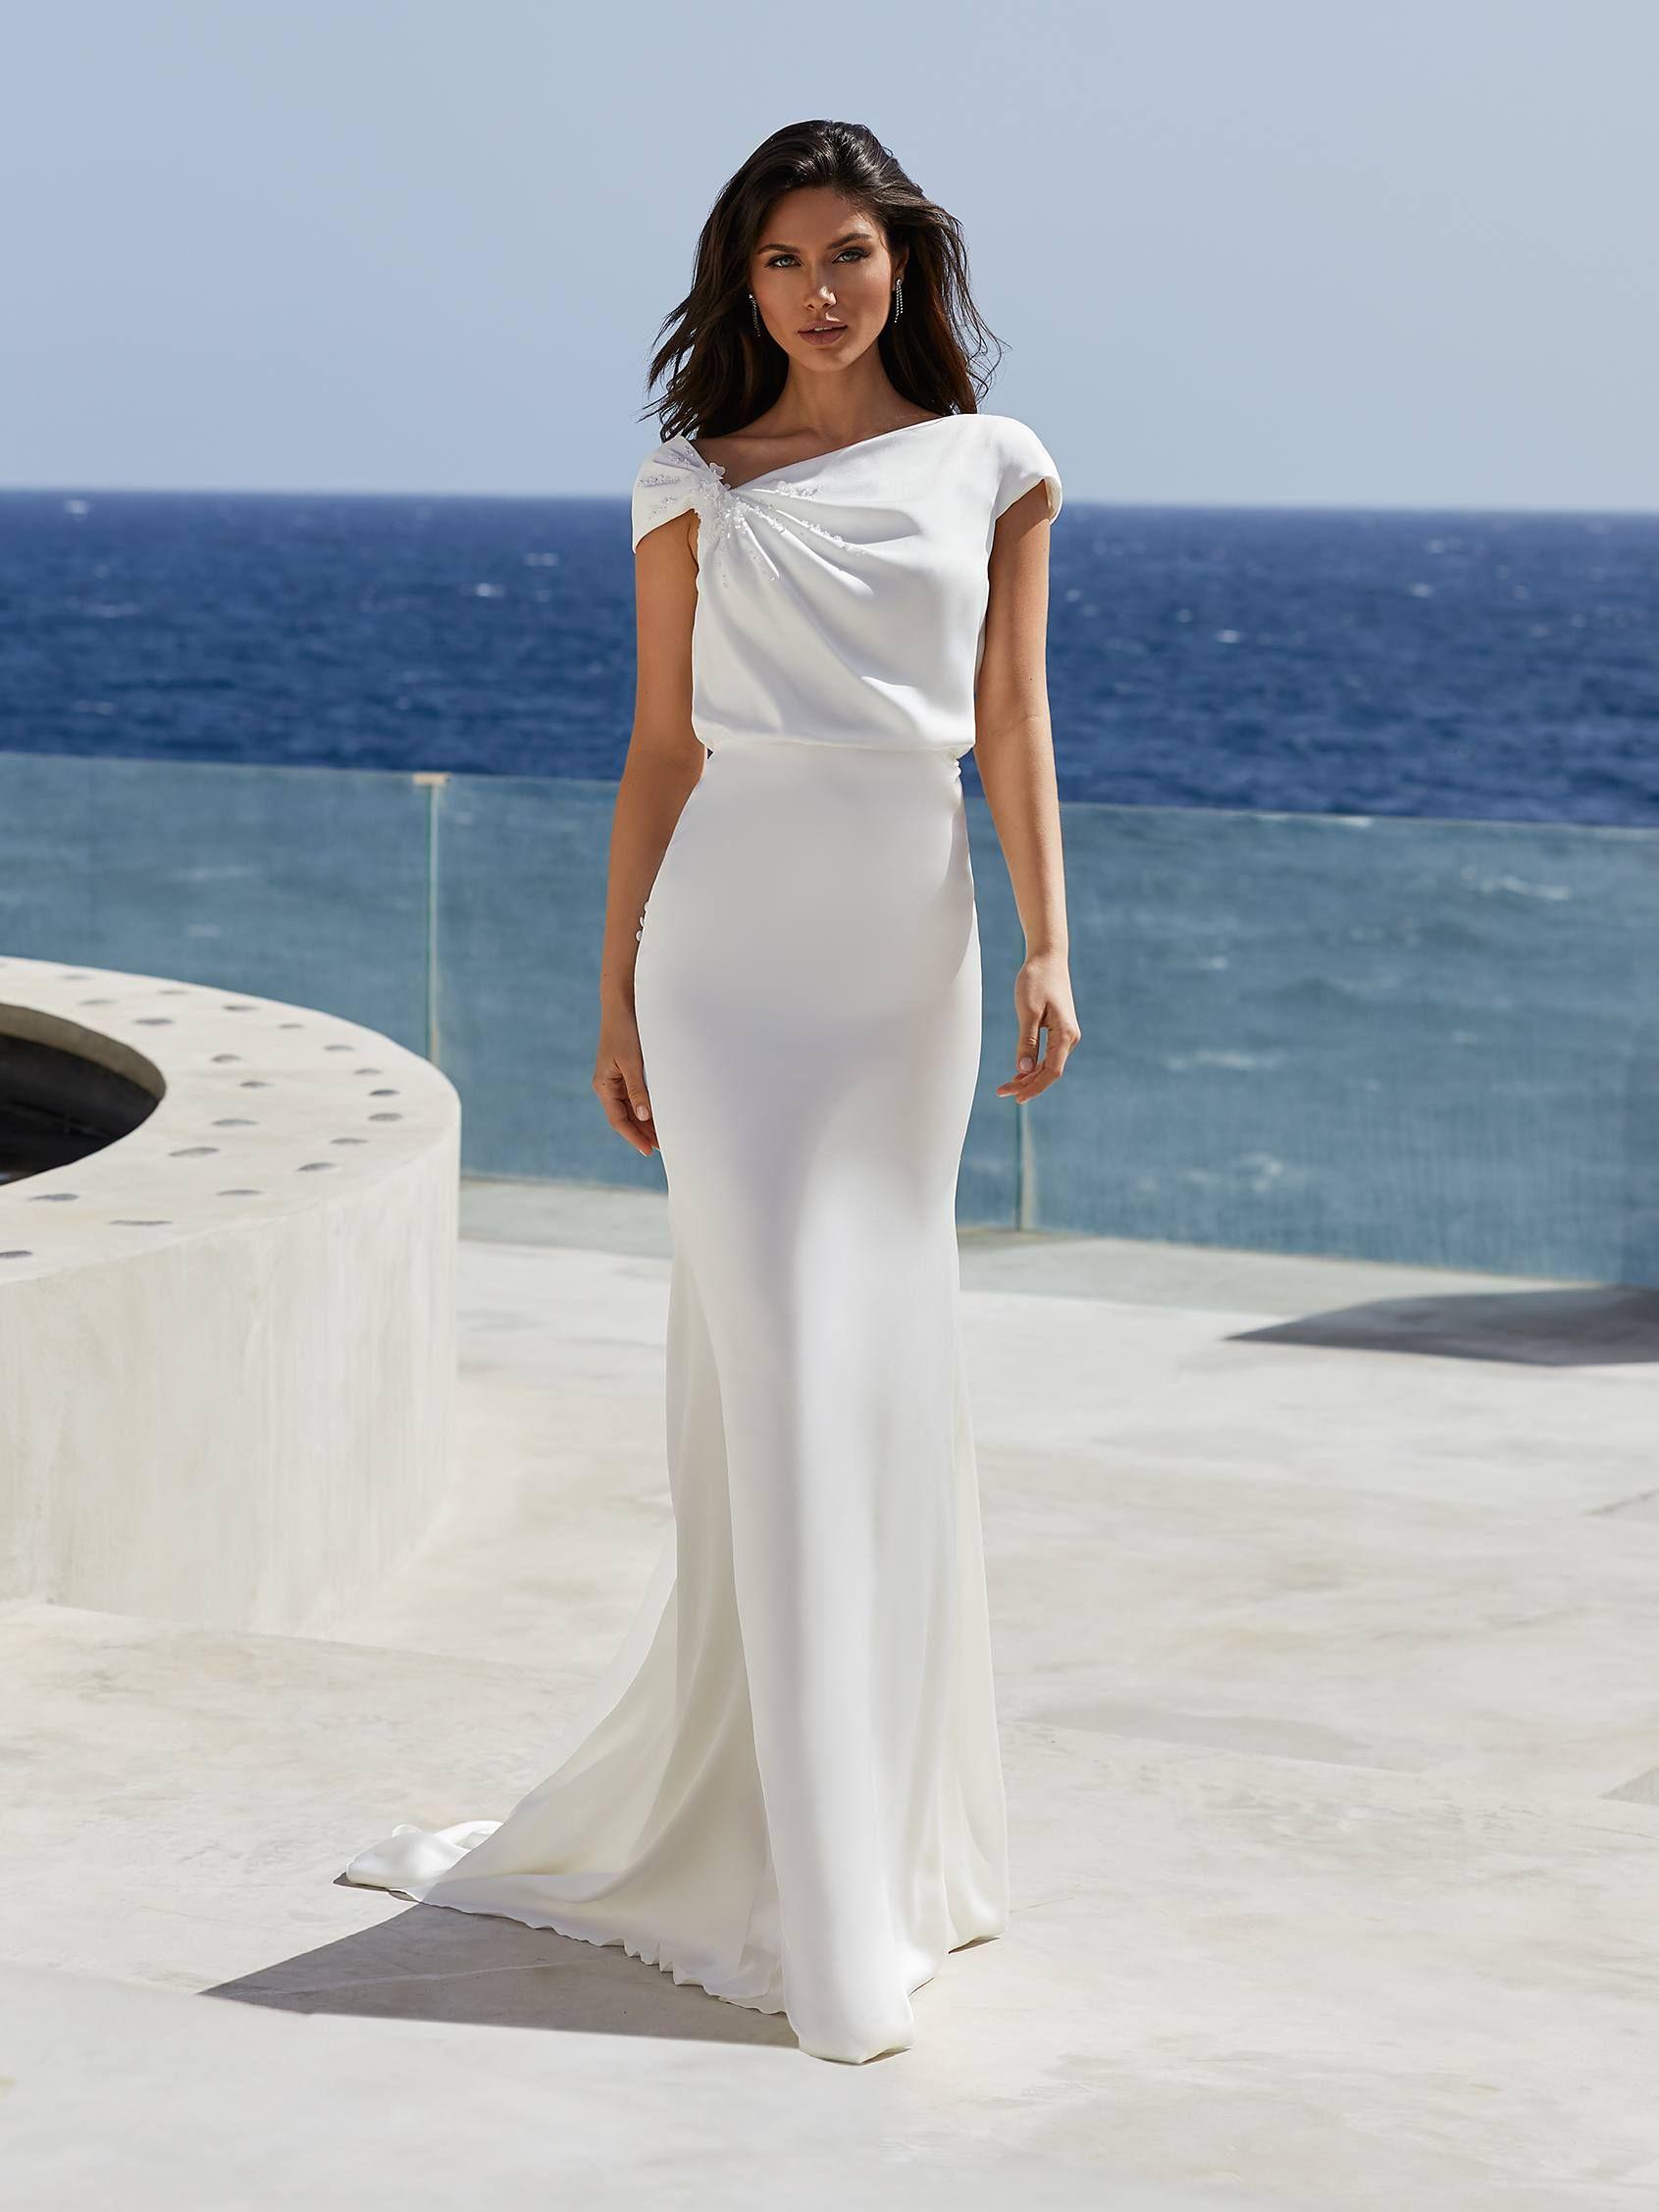 Mermaid Wedding Dress With Asymmetrical Neckline In 2020 Chic Wedding Gown Pronovias Wedding Dress Dresses [ 2255 x 1691 Pixel ]